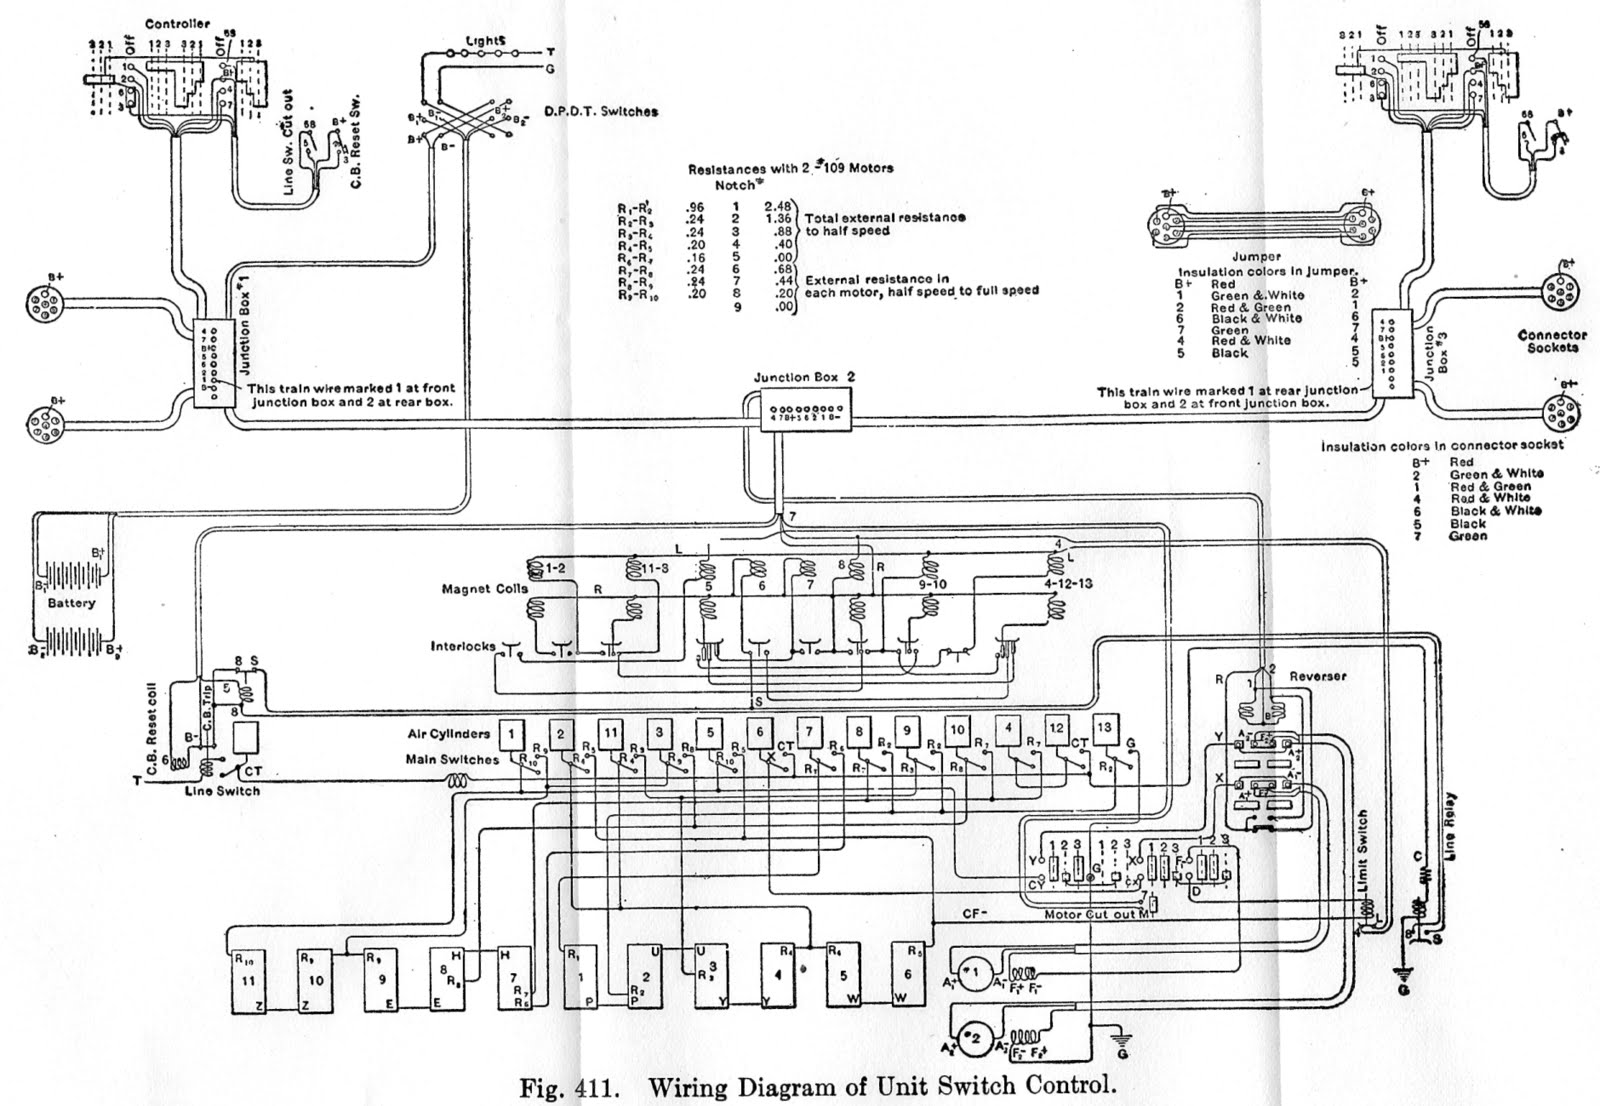 Westinghouse Electric Motor Wiring Diagram Hpm 450p Dimmer Hicks Car Works Control Circuit Diagrams